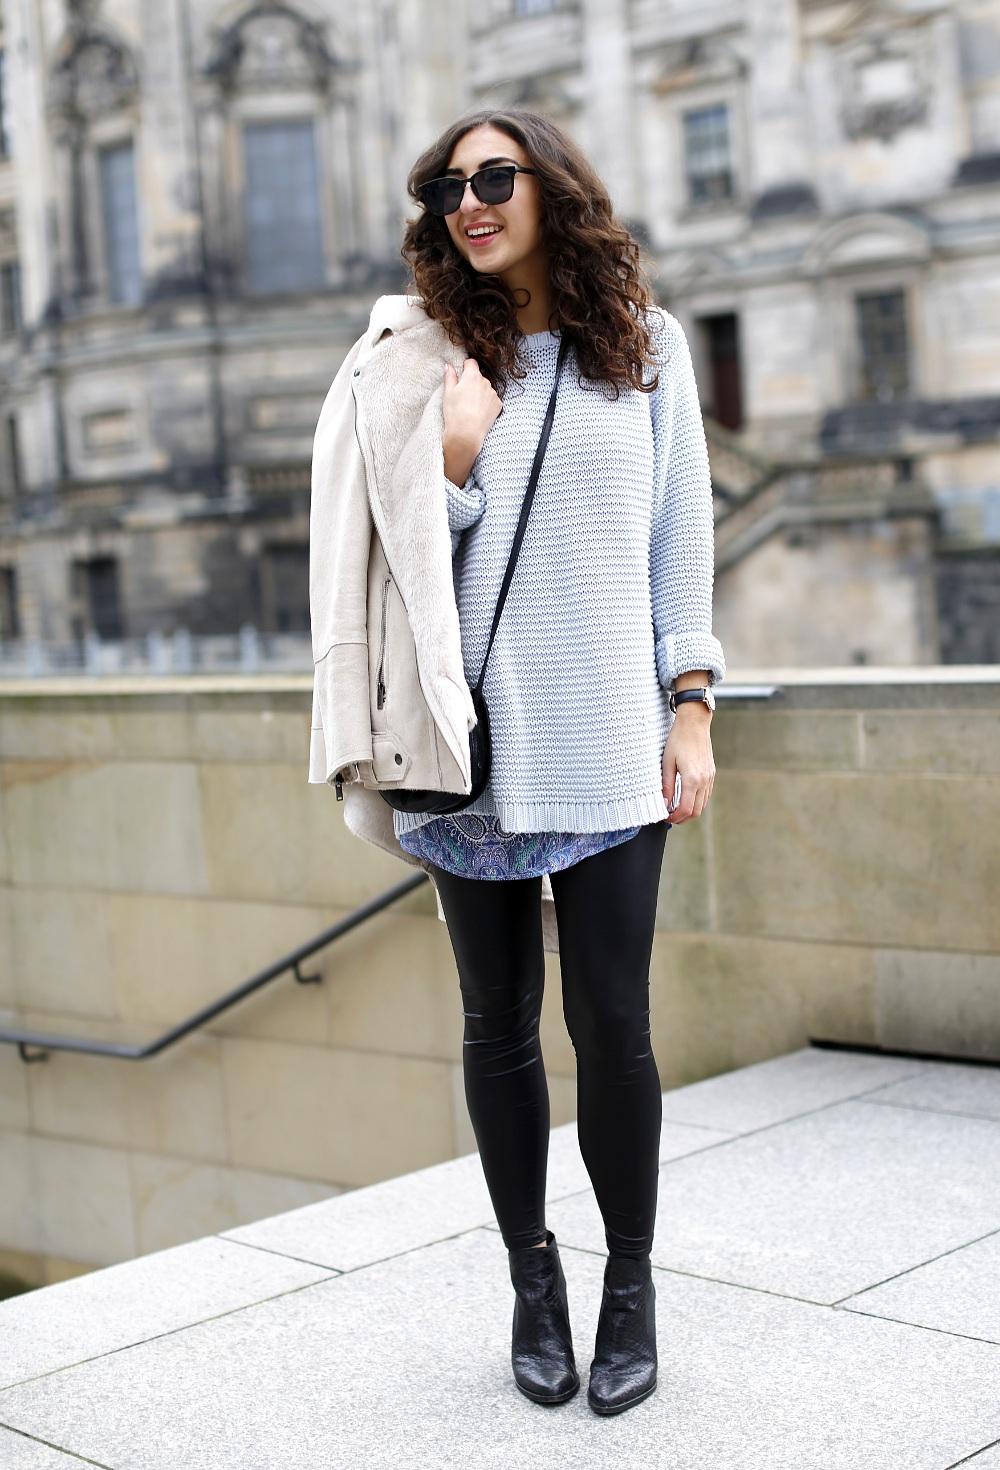 Leather Leggings Outfit layering paisley dress oversize babyblue sweater leather leggings shearling jacket streetstyle winter blogger look samieze leder hose